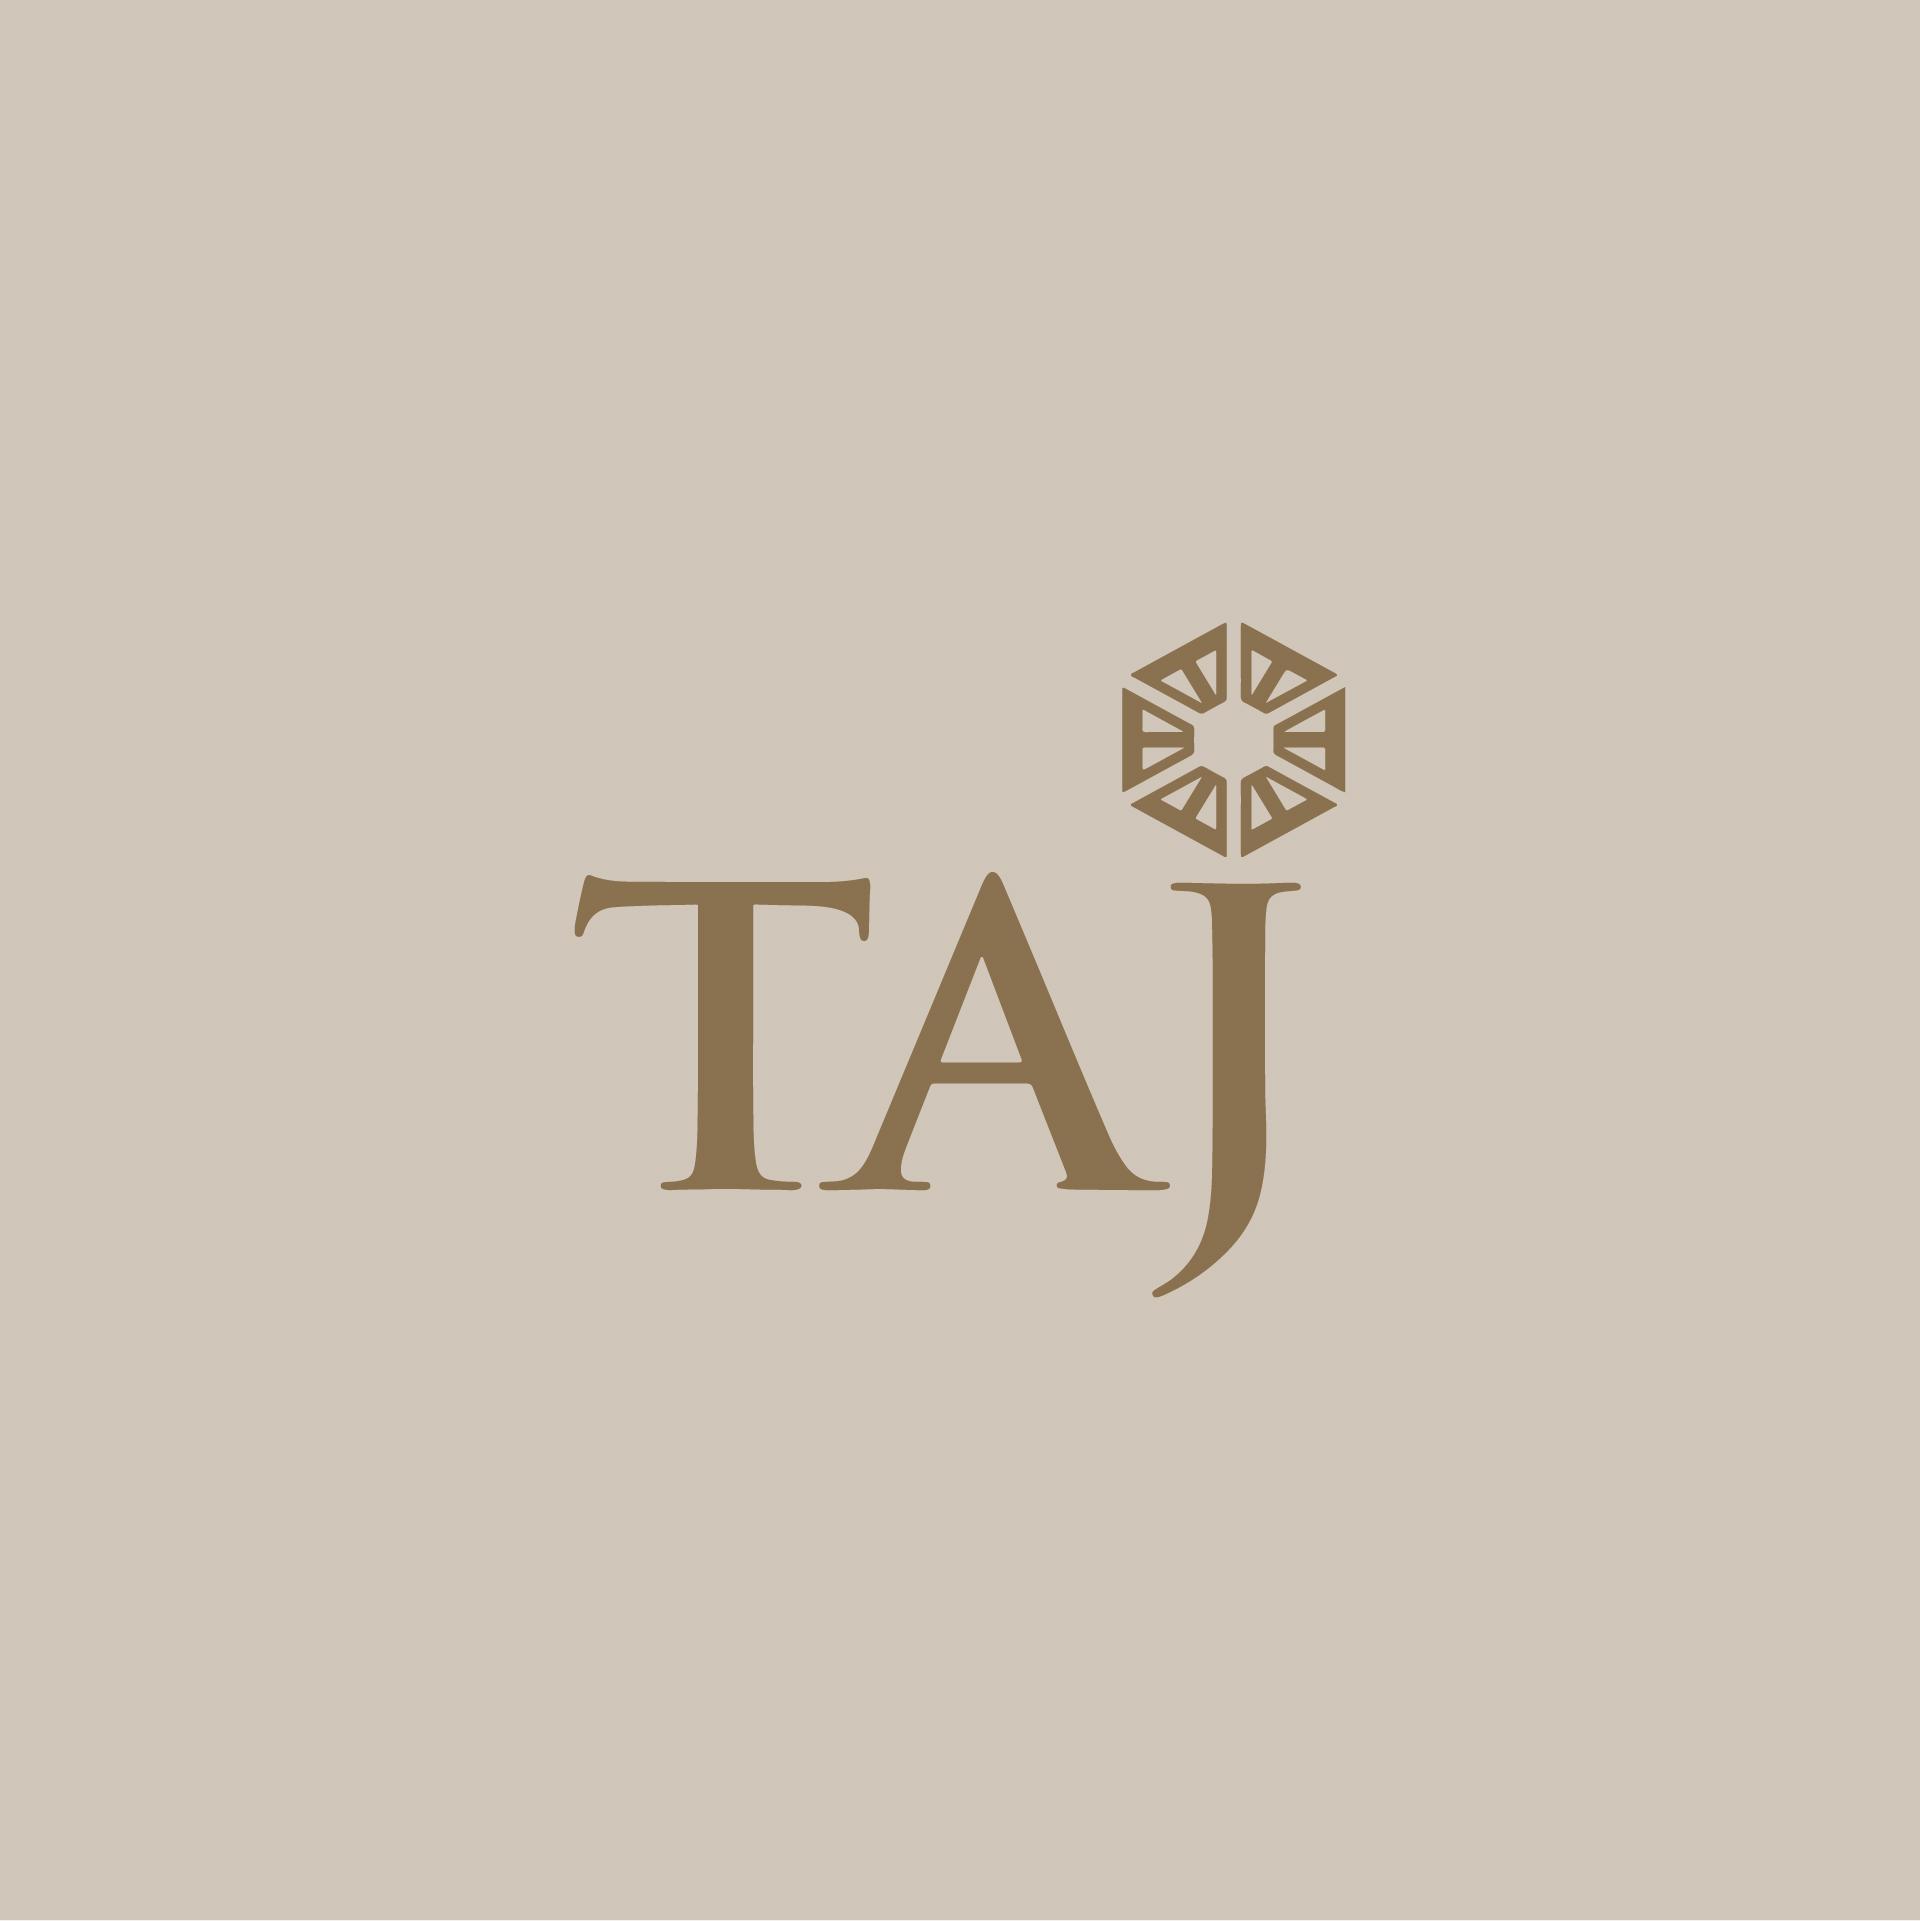 Taj Hotel Discount eVouchers Online